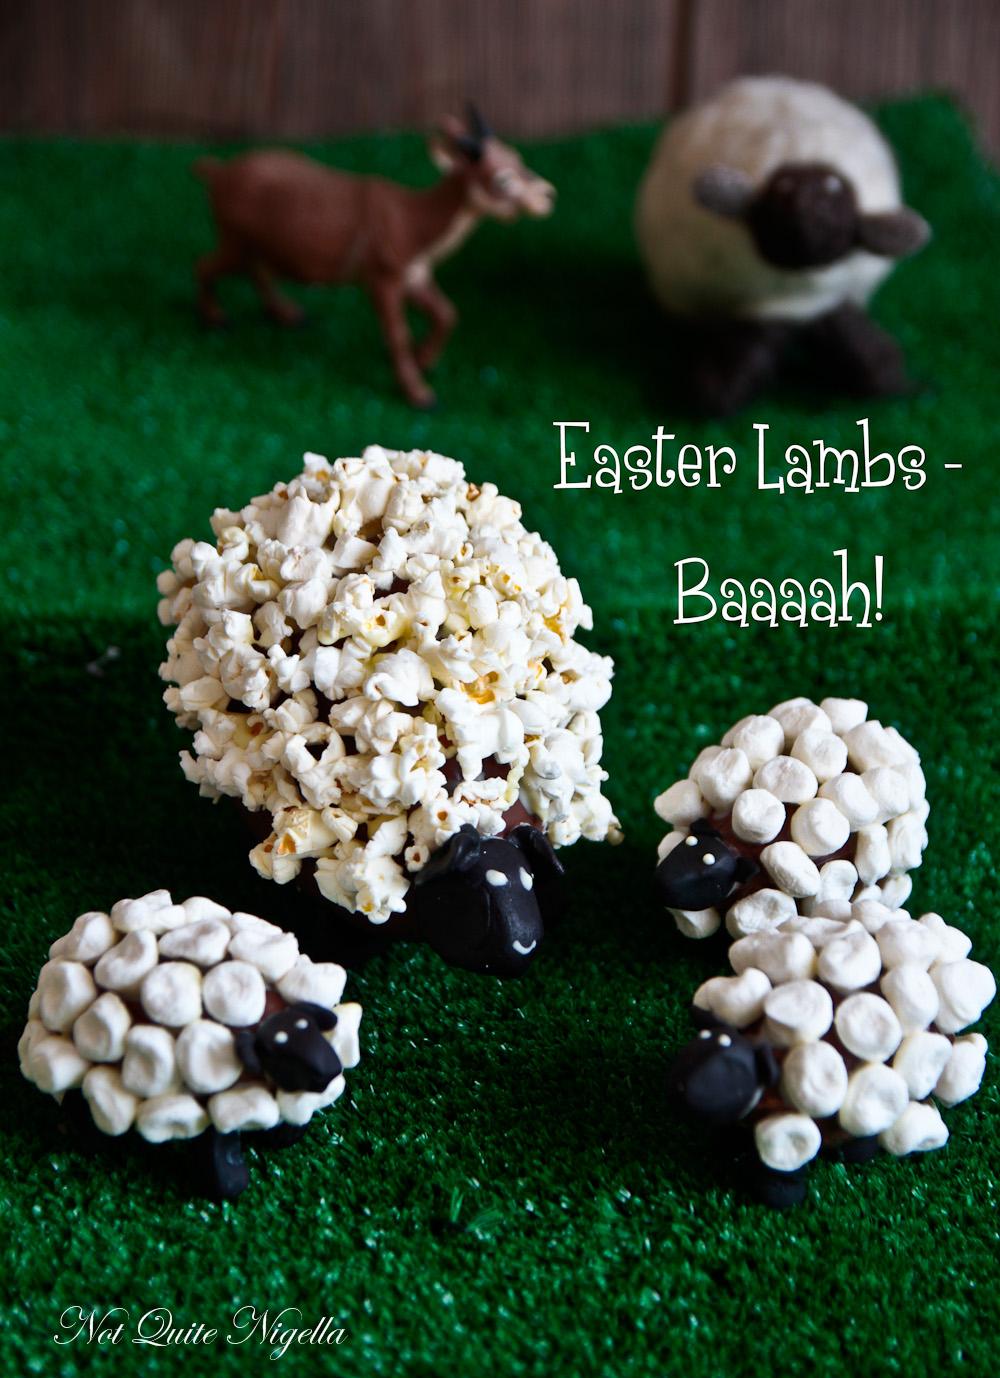 Chocolate Easter Lambs